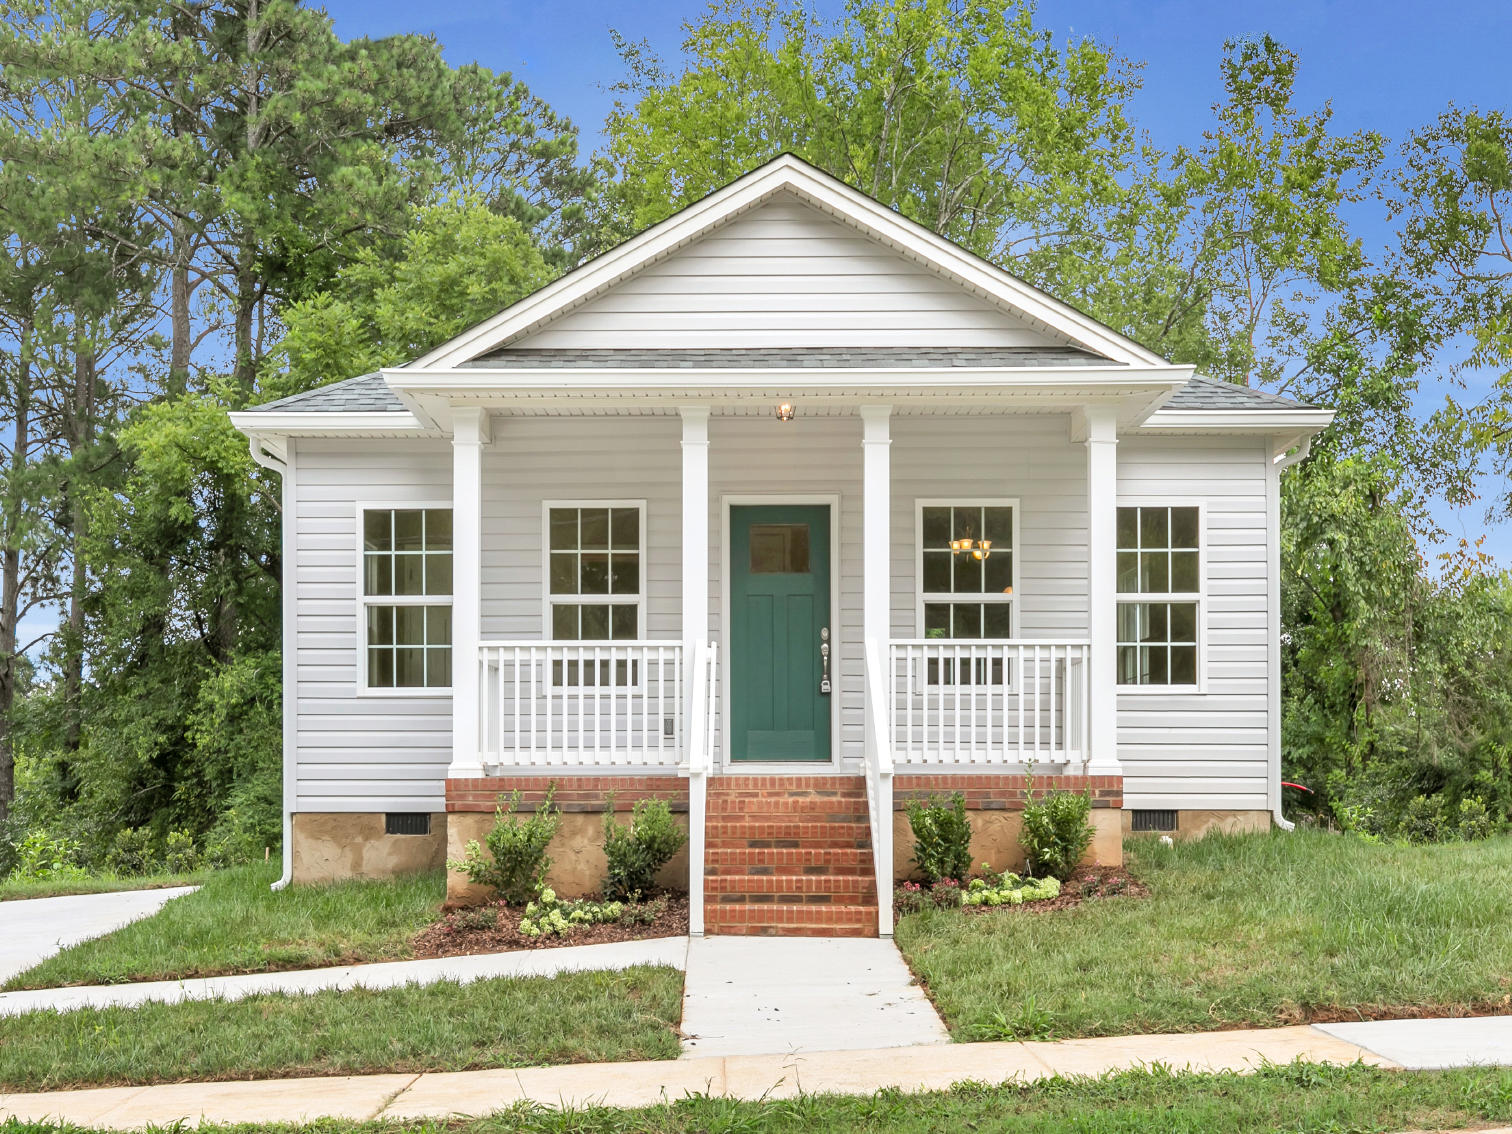 706 Woodmore Ln, Chattanooga, TN 37411